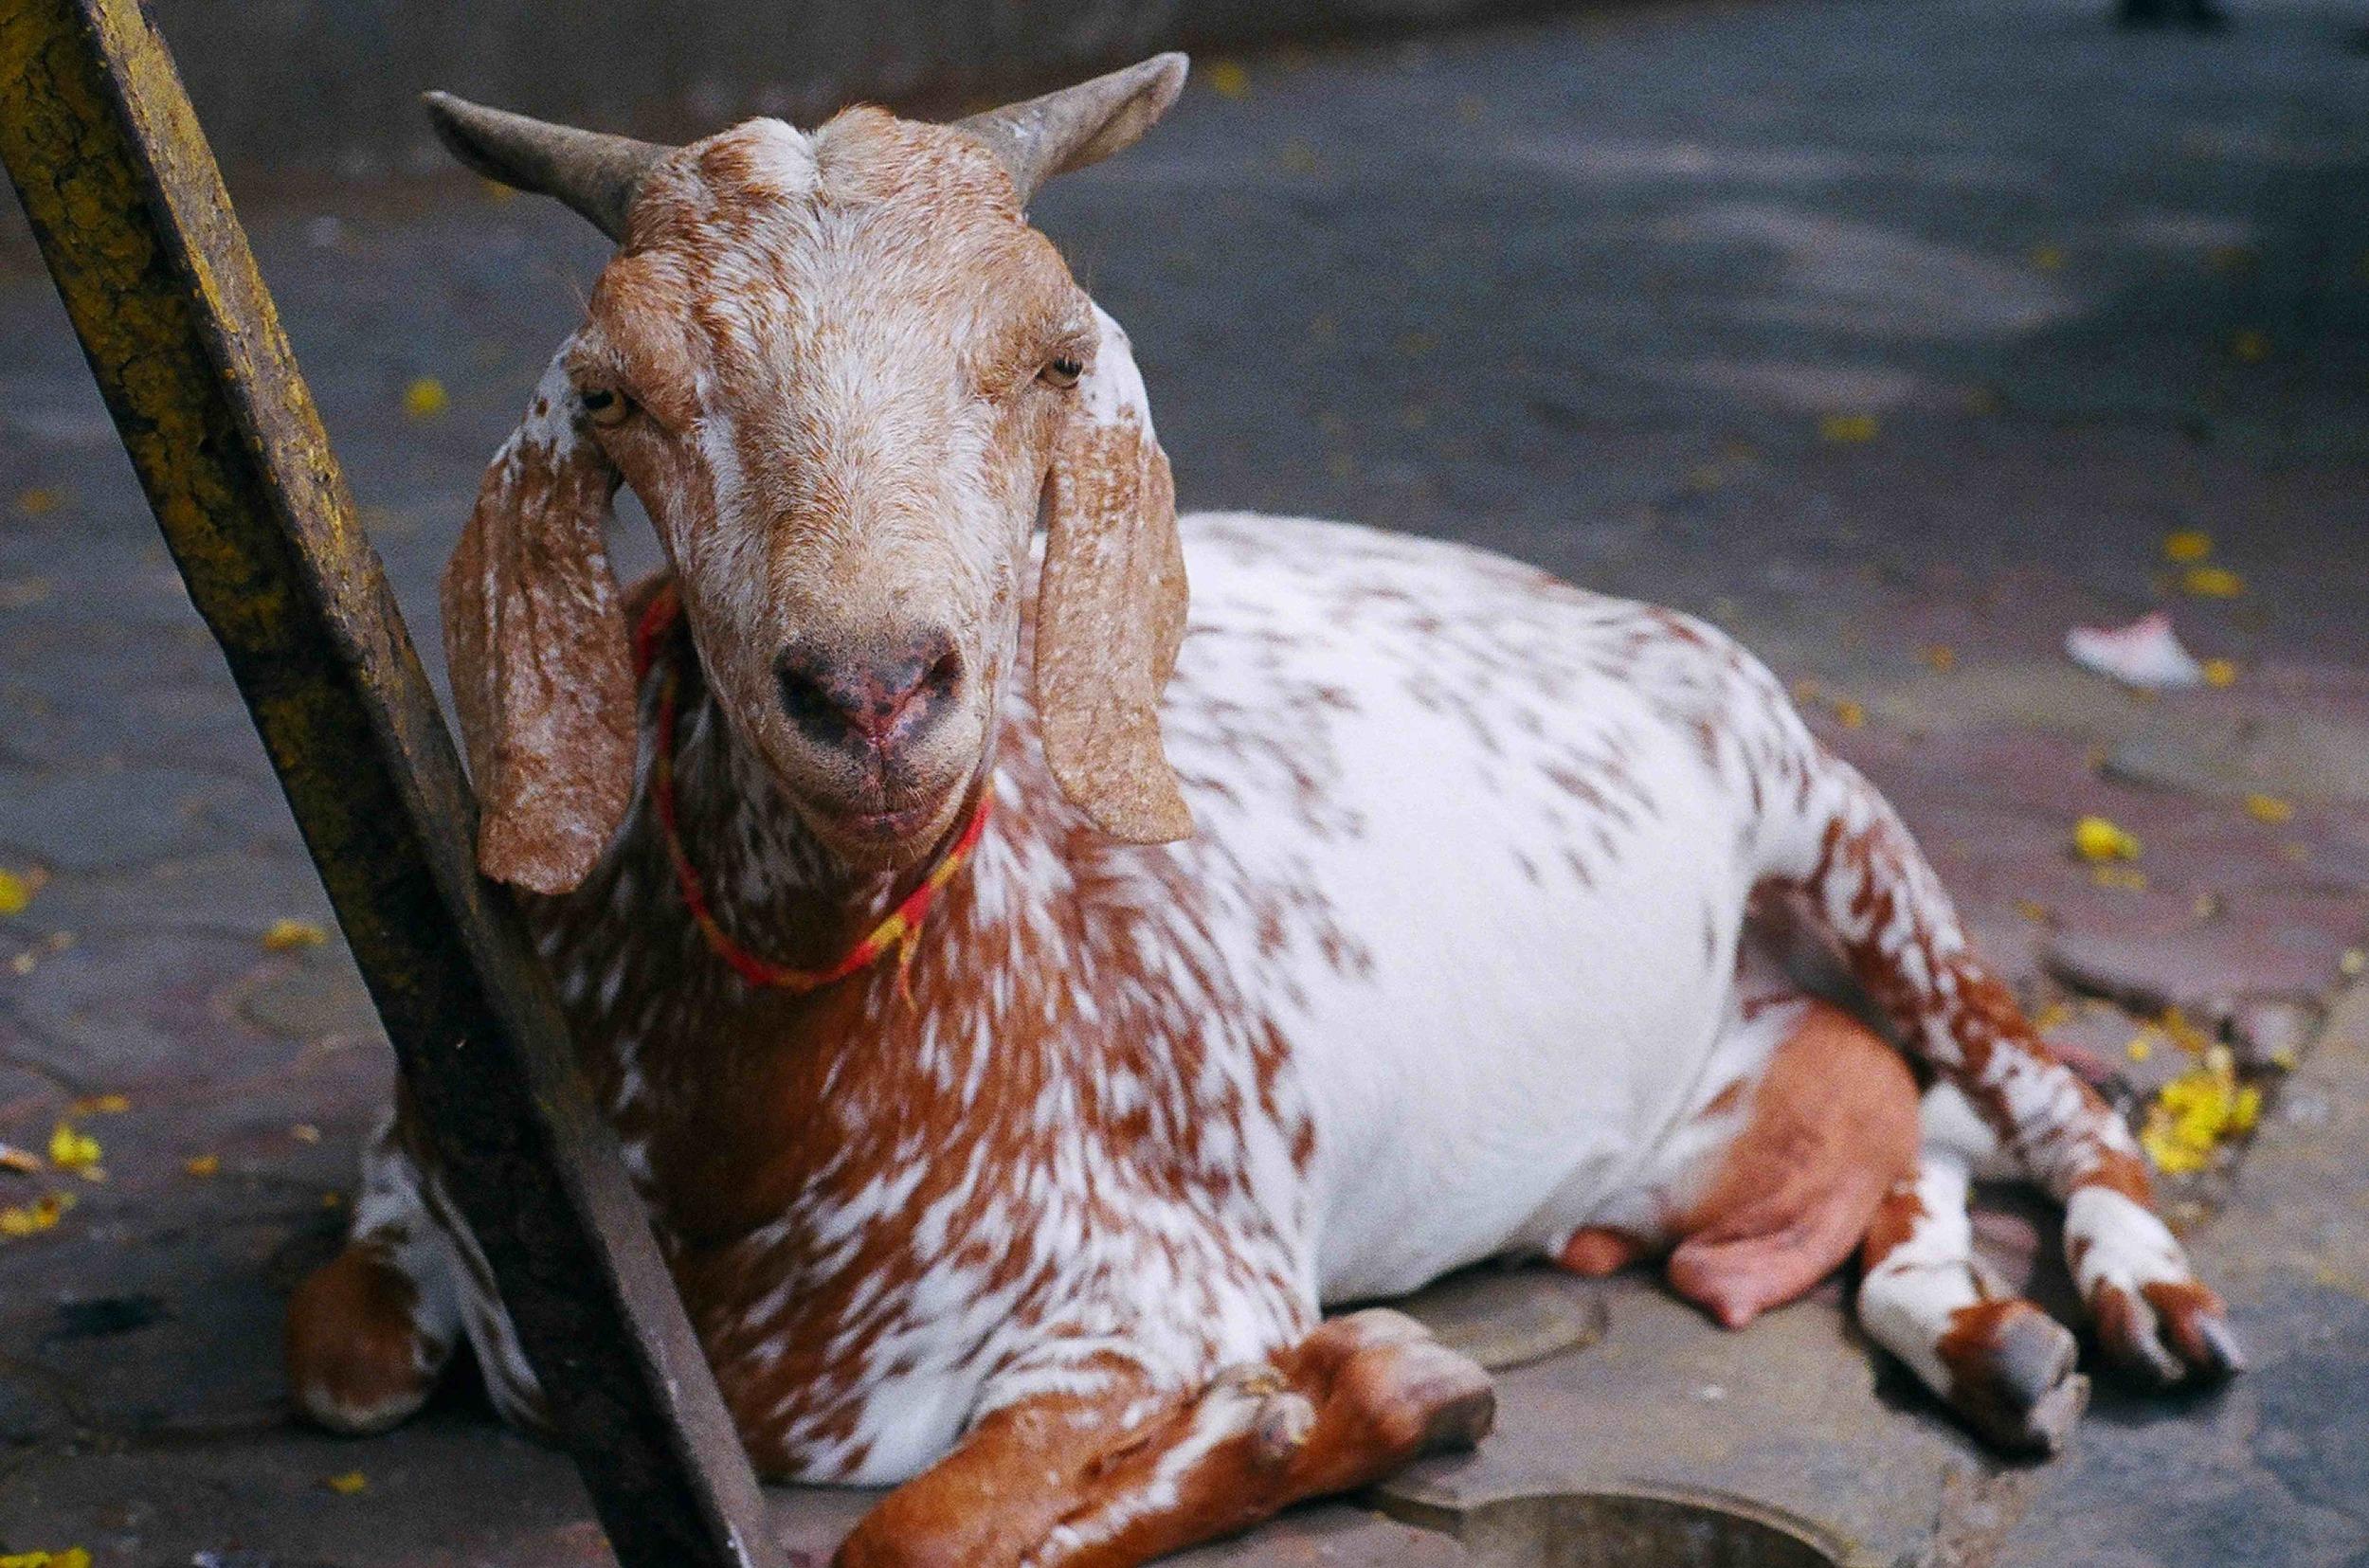 goat11.5x17.375.jpg